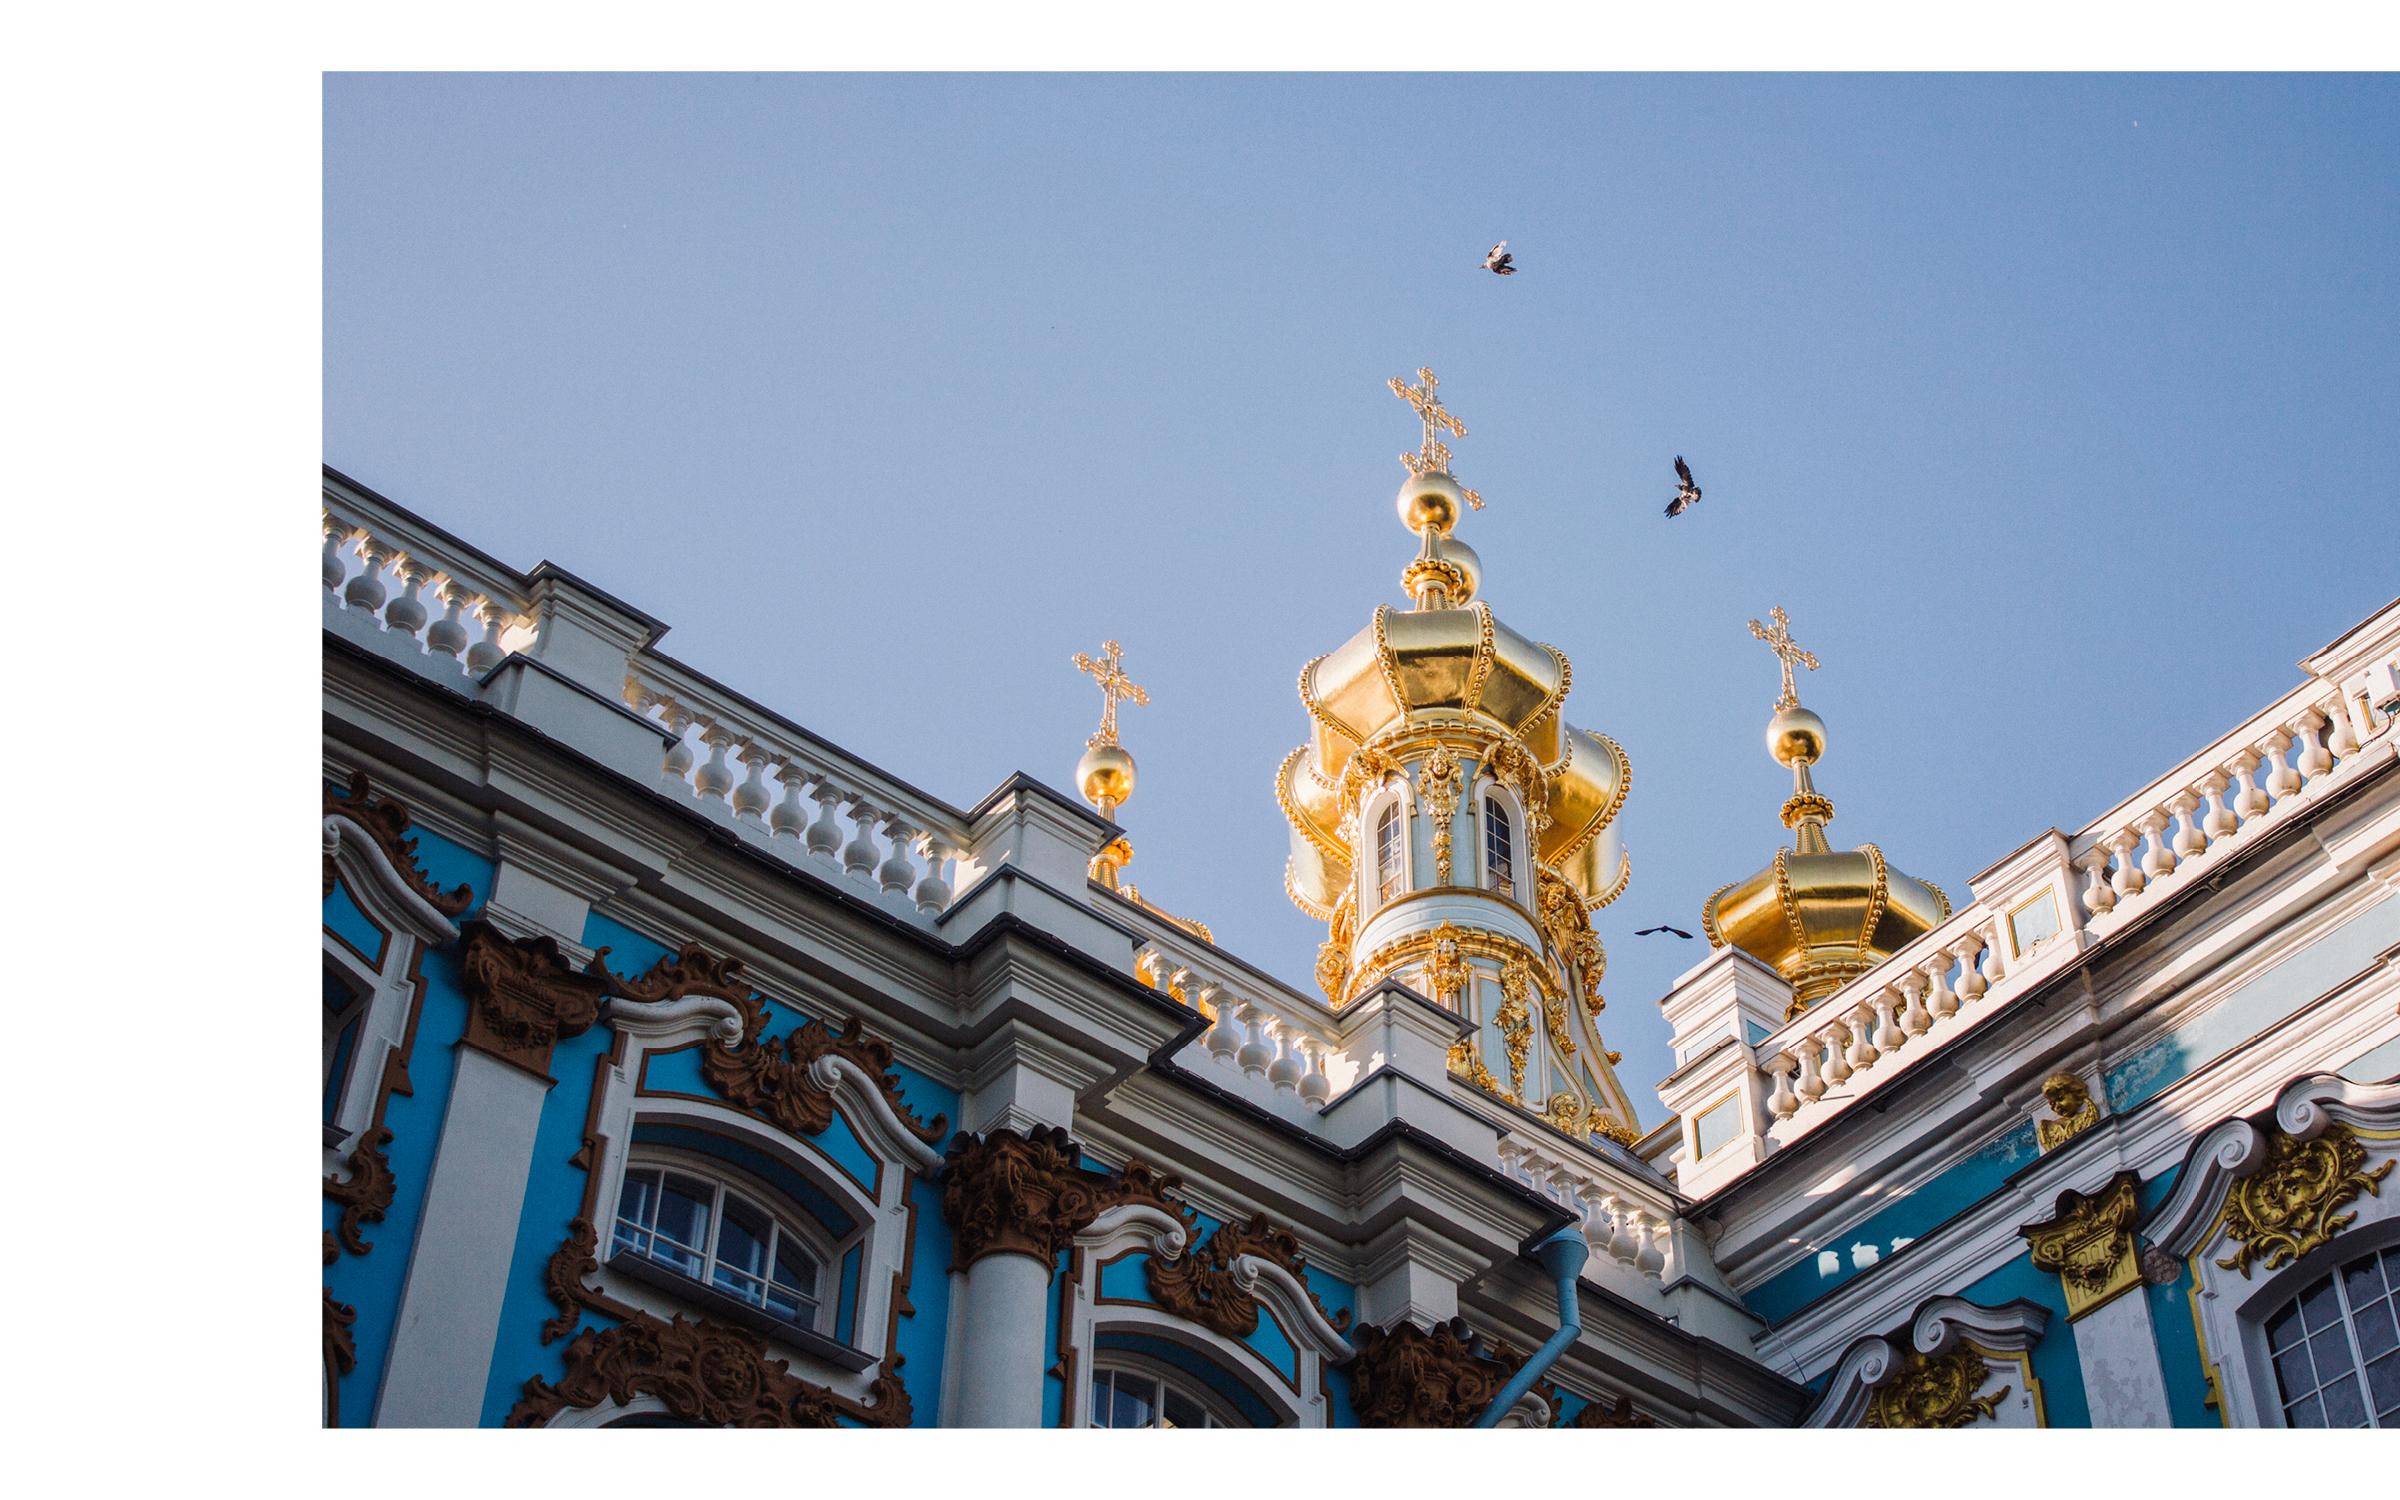 Kovtun_008_Russia_Photo_Book.jpg